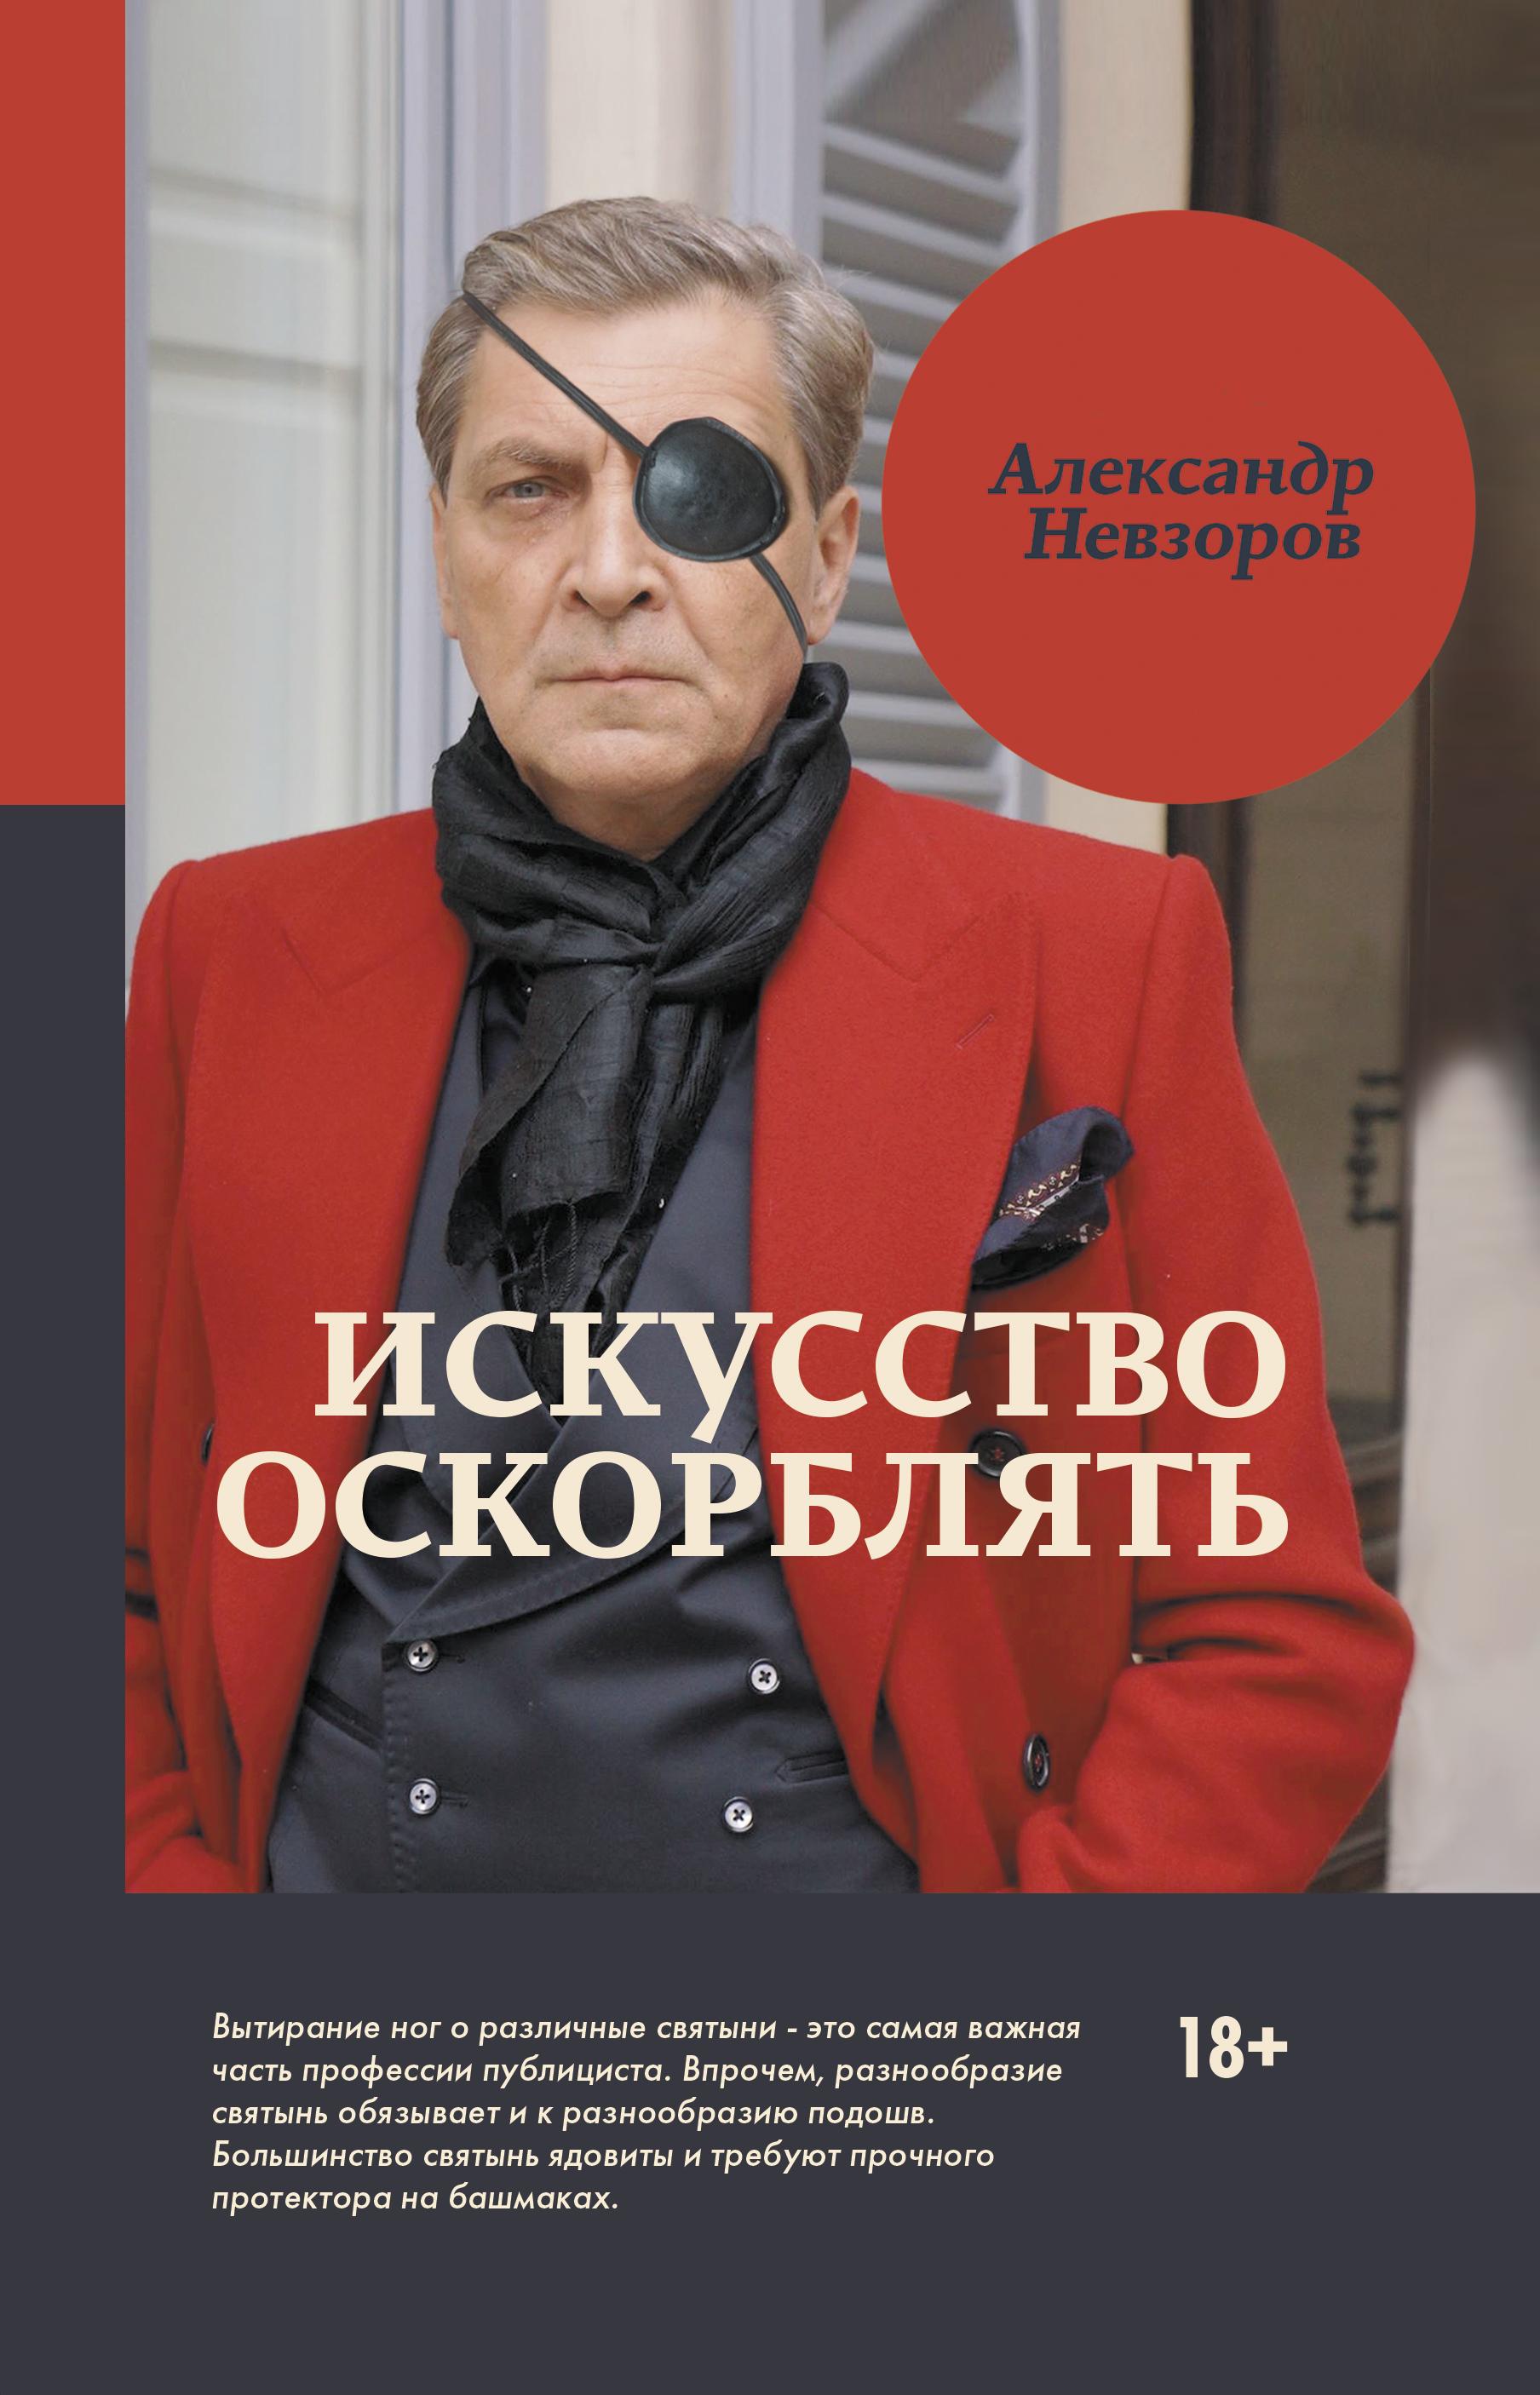 Александр Невзоров Искусство оскорблять александр невзоров искусство оскорблять